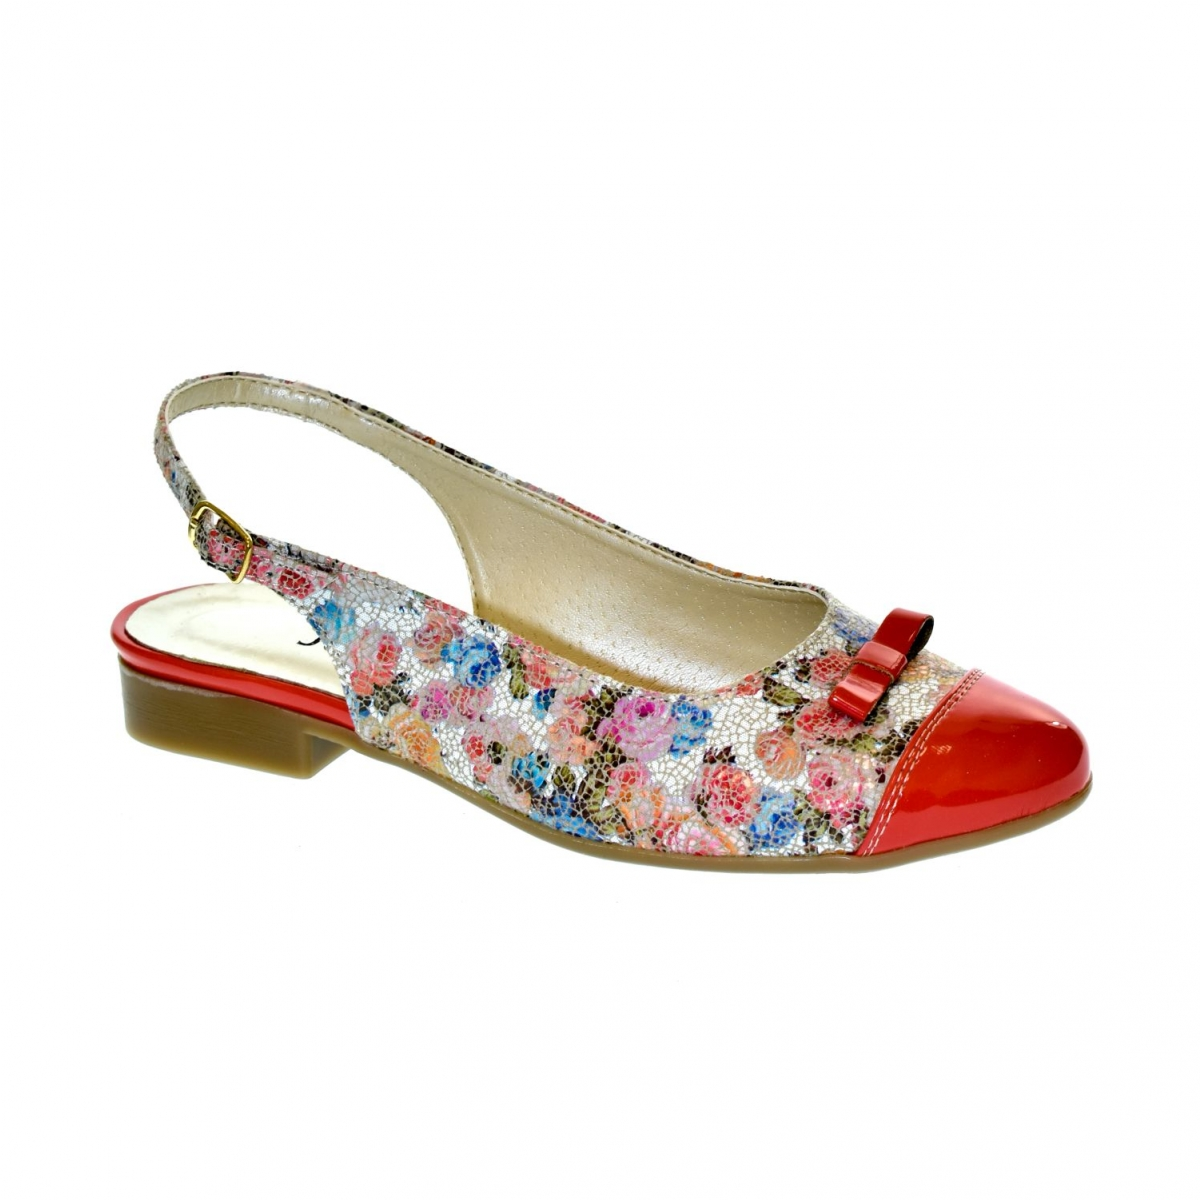 c94a008c288a Dámske korálové sandále EVELINE - 2